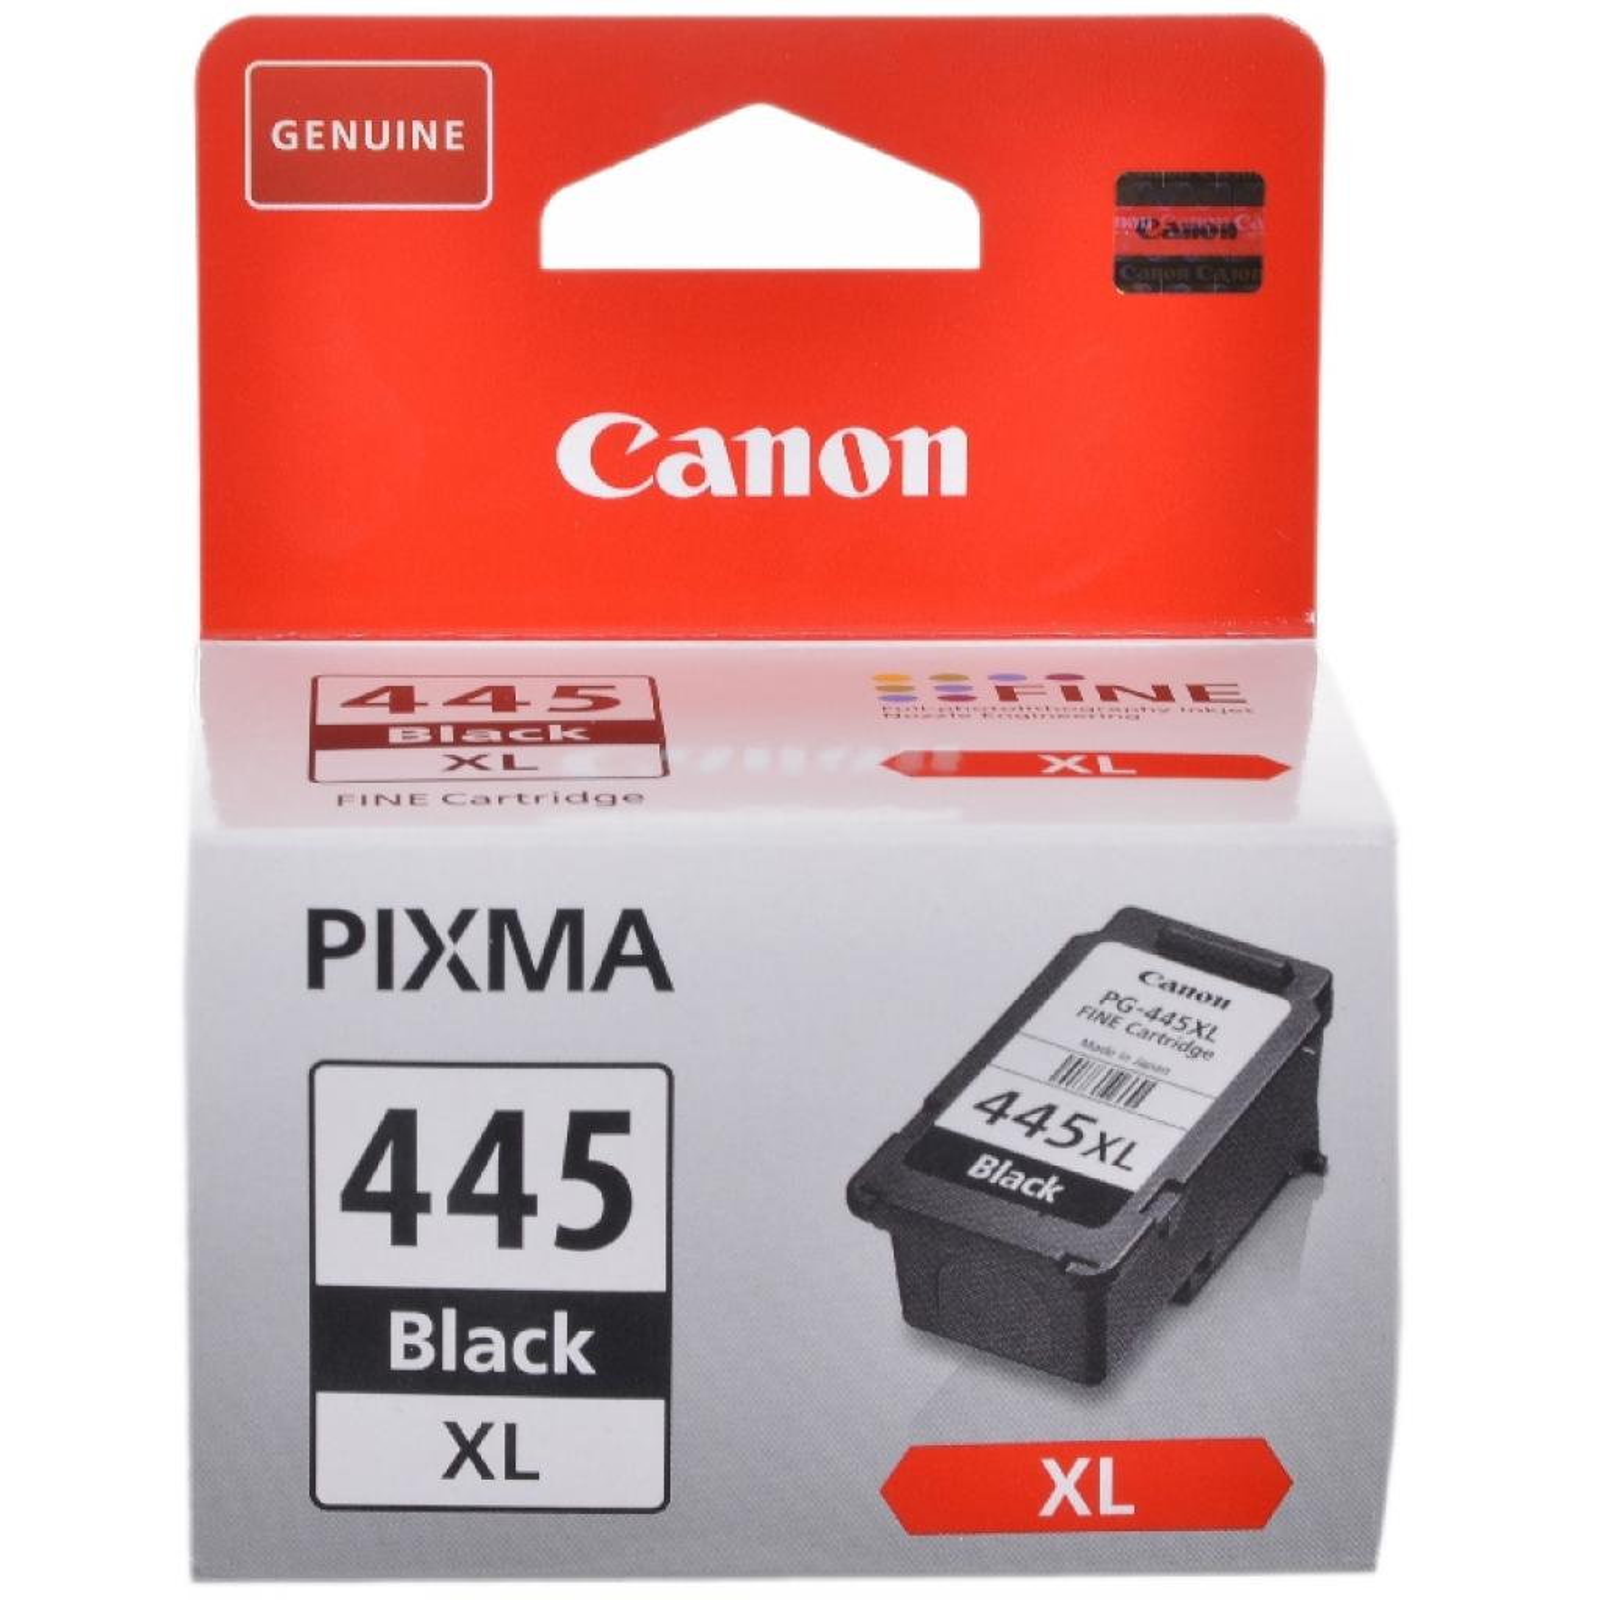 Картридж Canon PG-445XL Black для MG2440 (8282B001) изображение 2